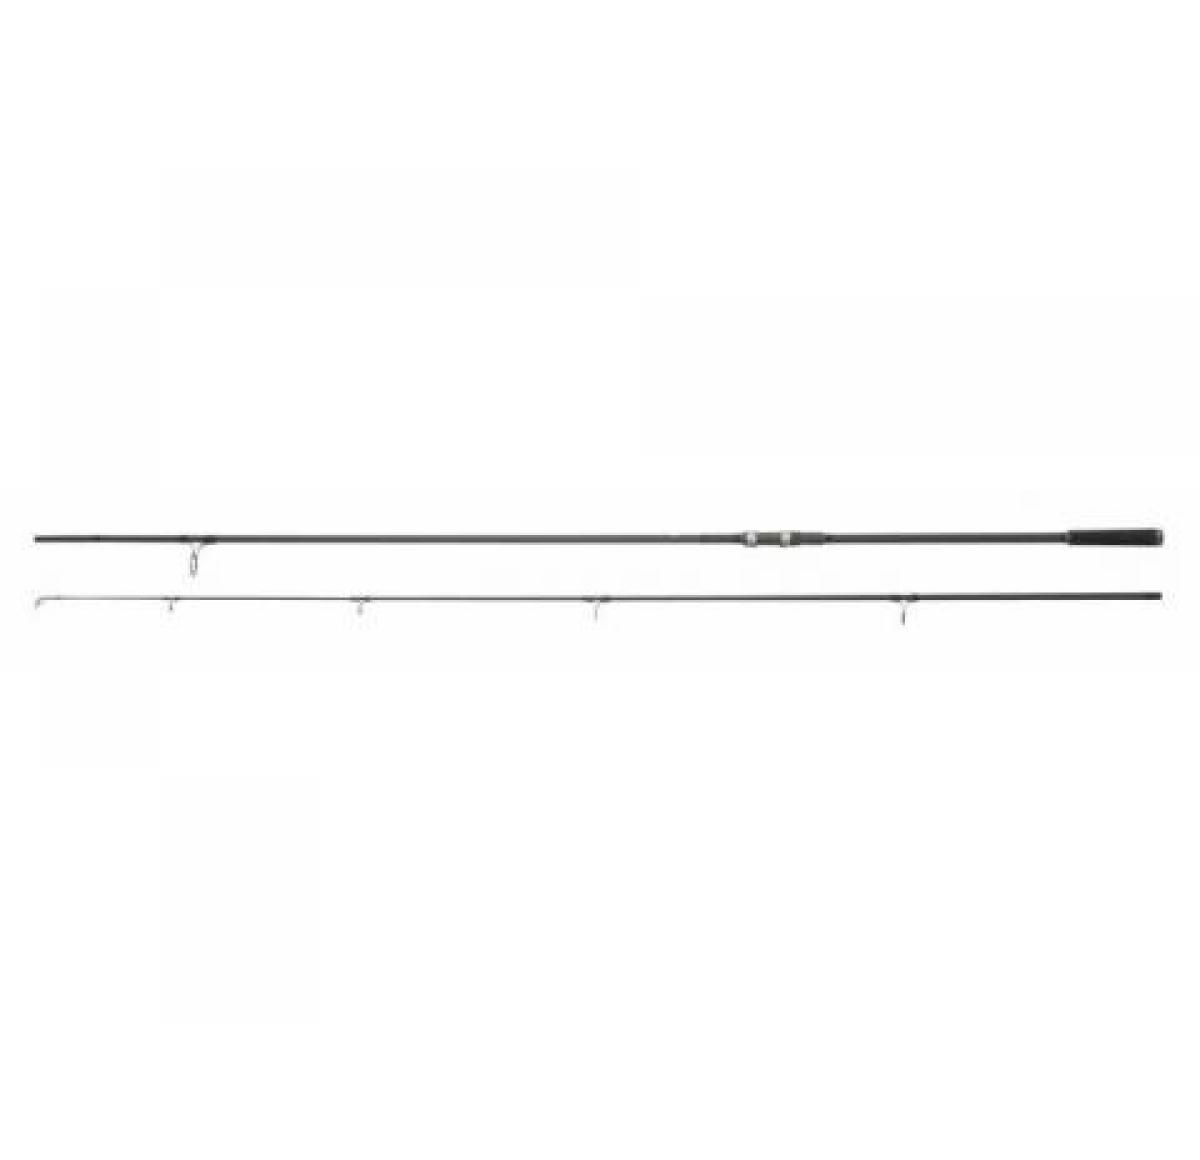 Pelzer Bullet 366 cm 2.5 lbs